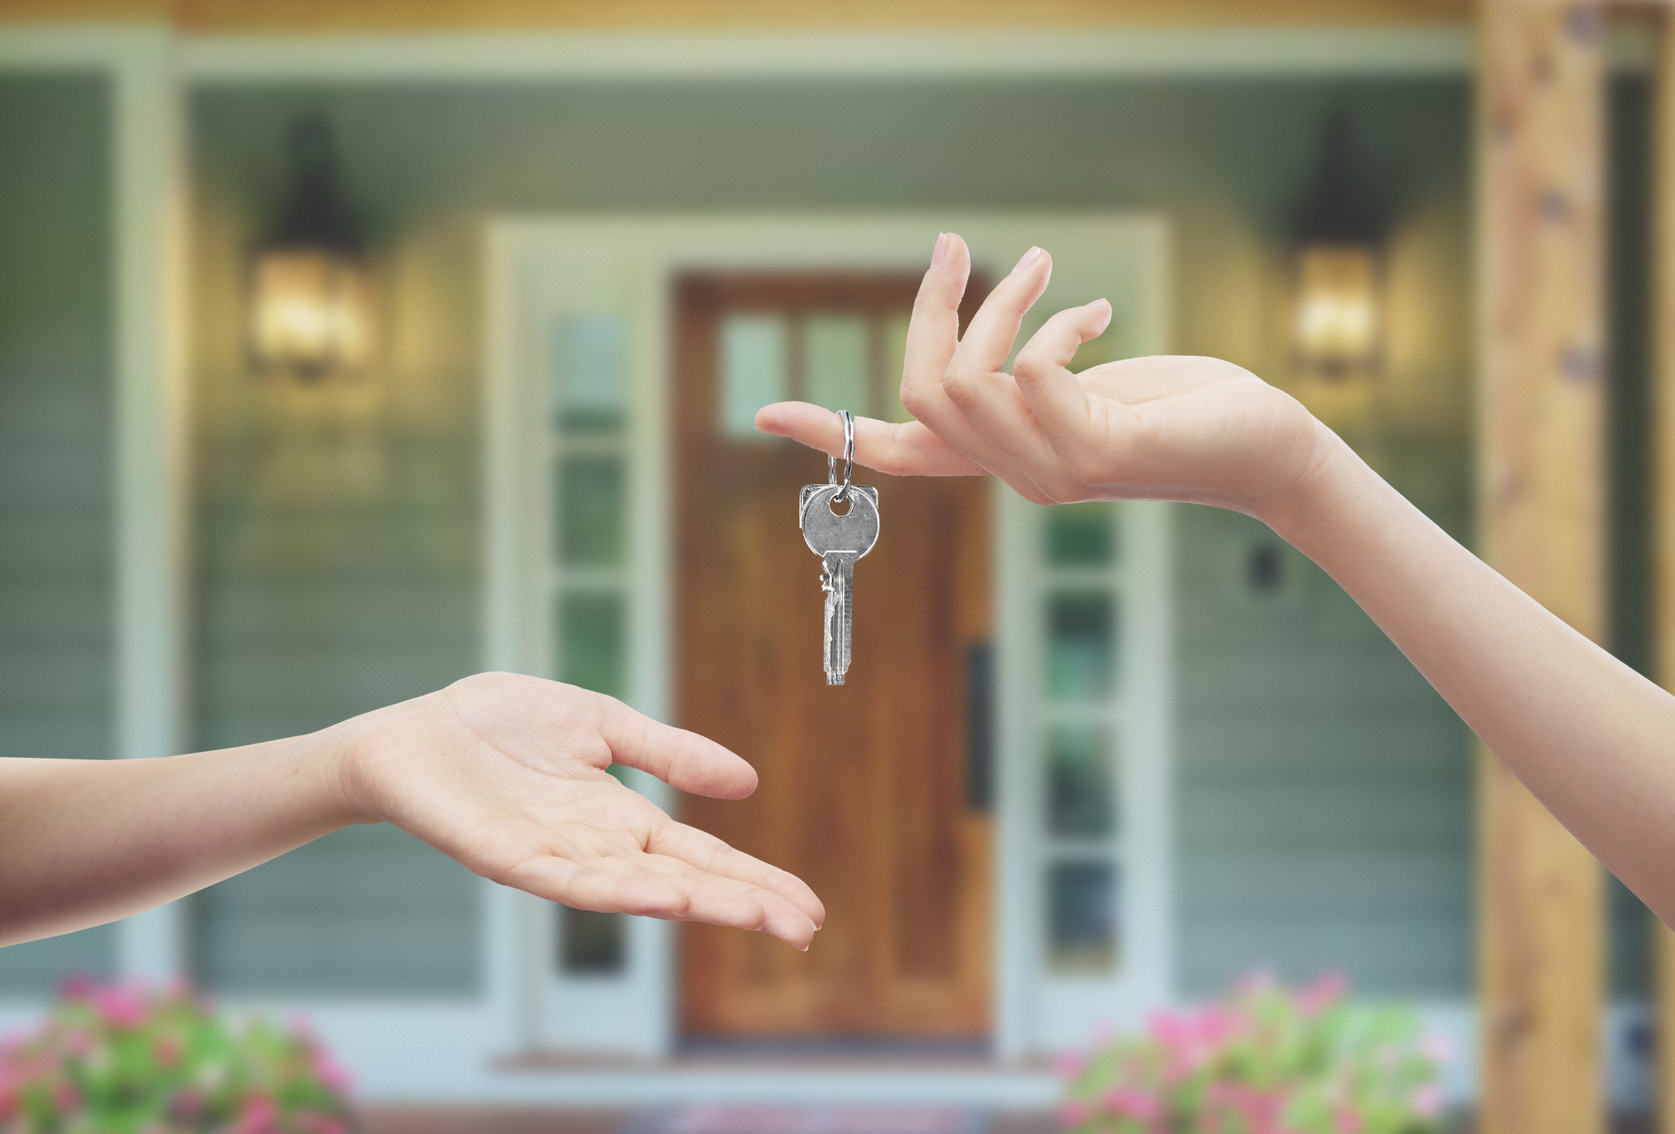 House key exchange